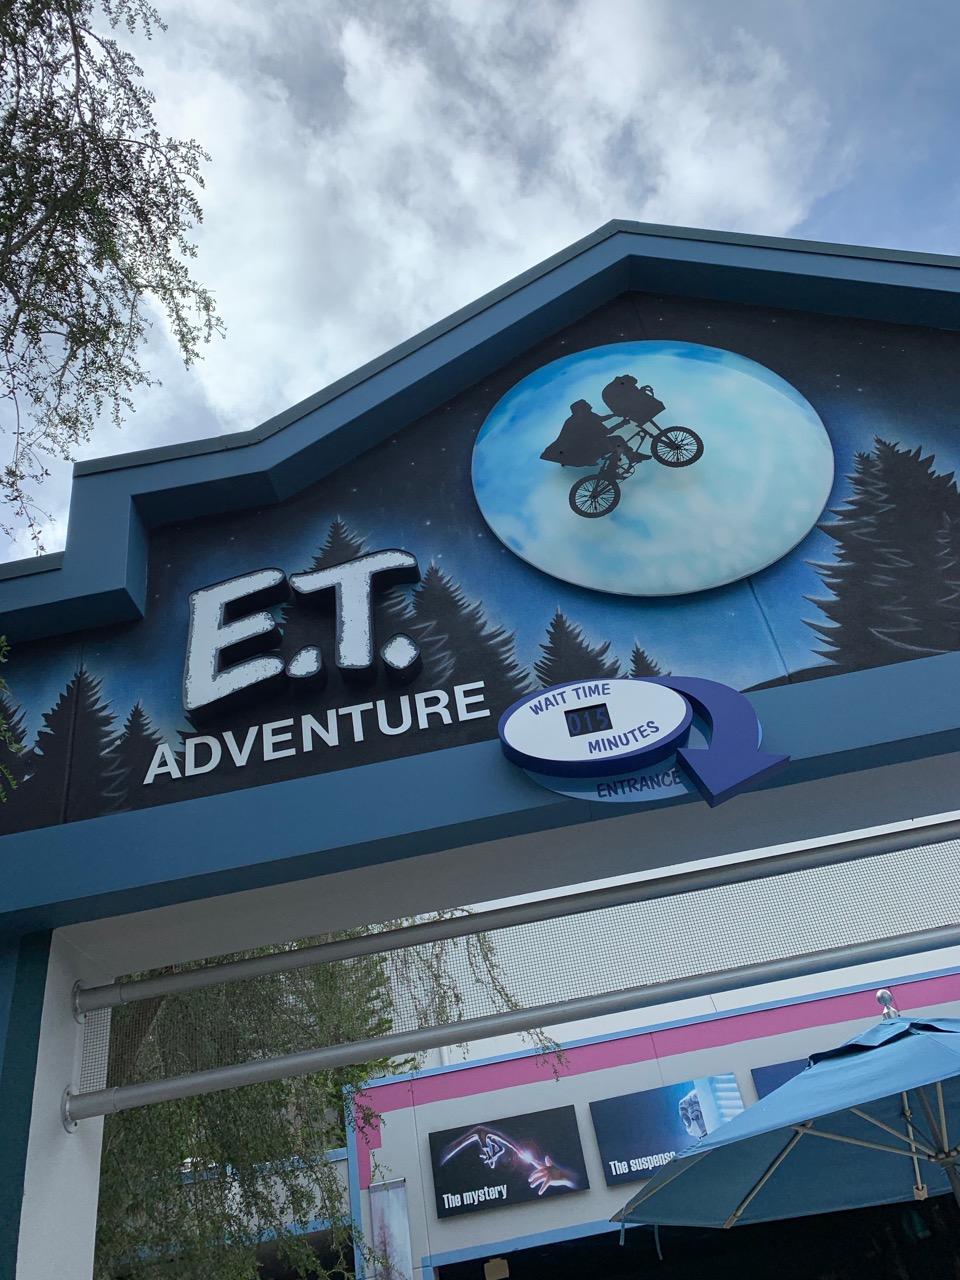 universal studios florida rides guide best rides et adventure.jpeg